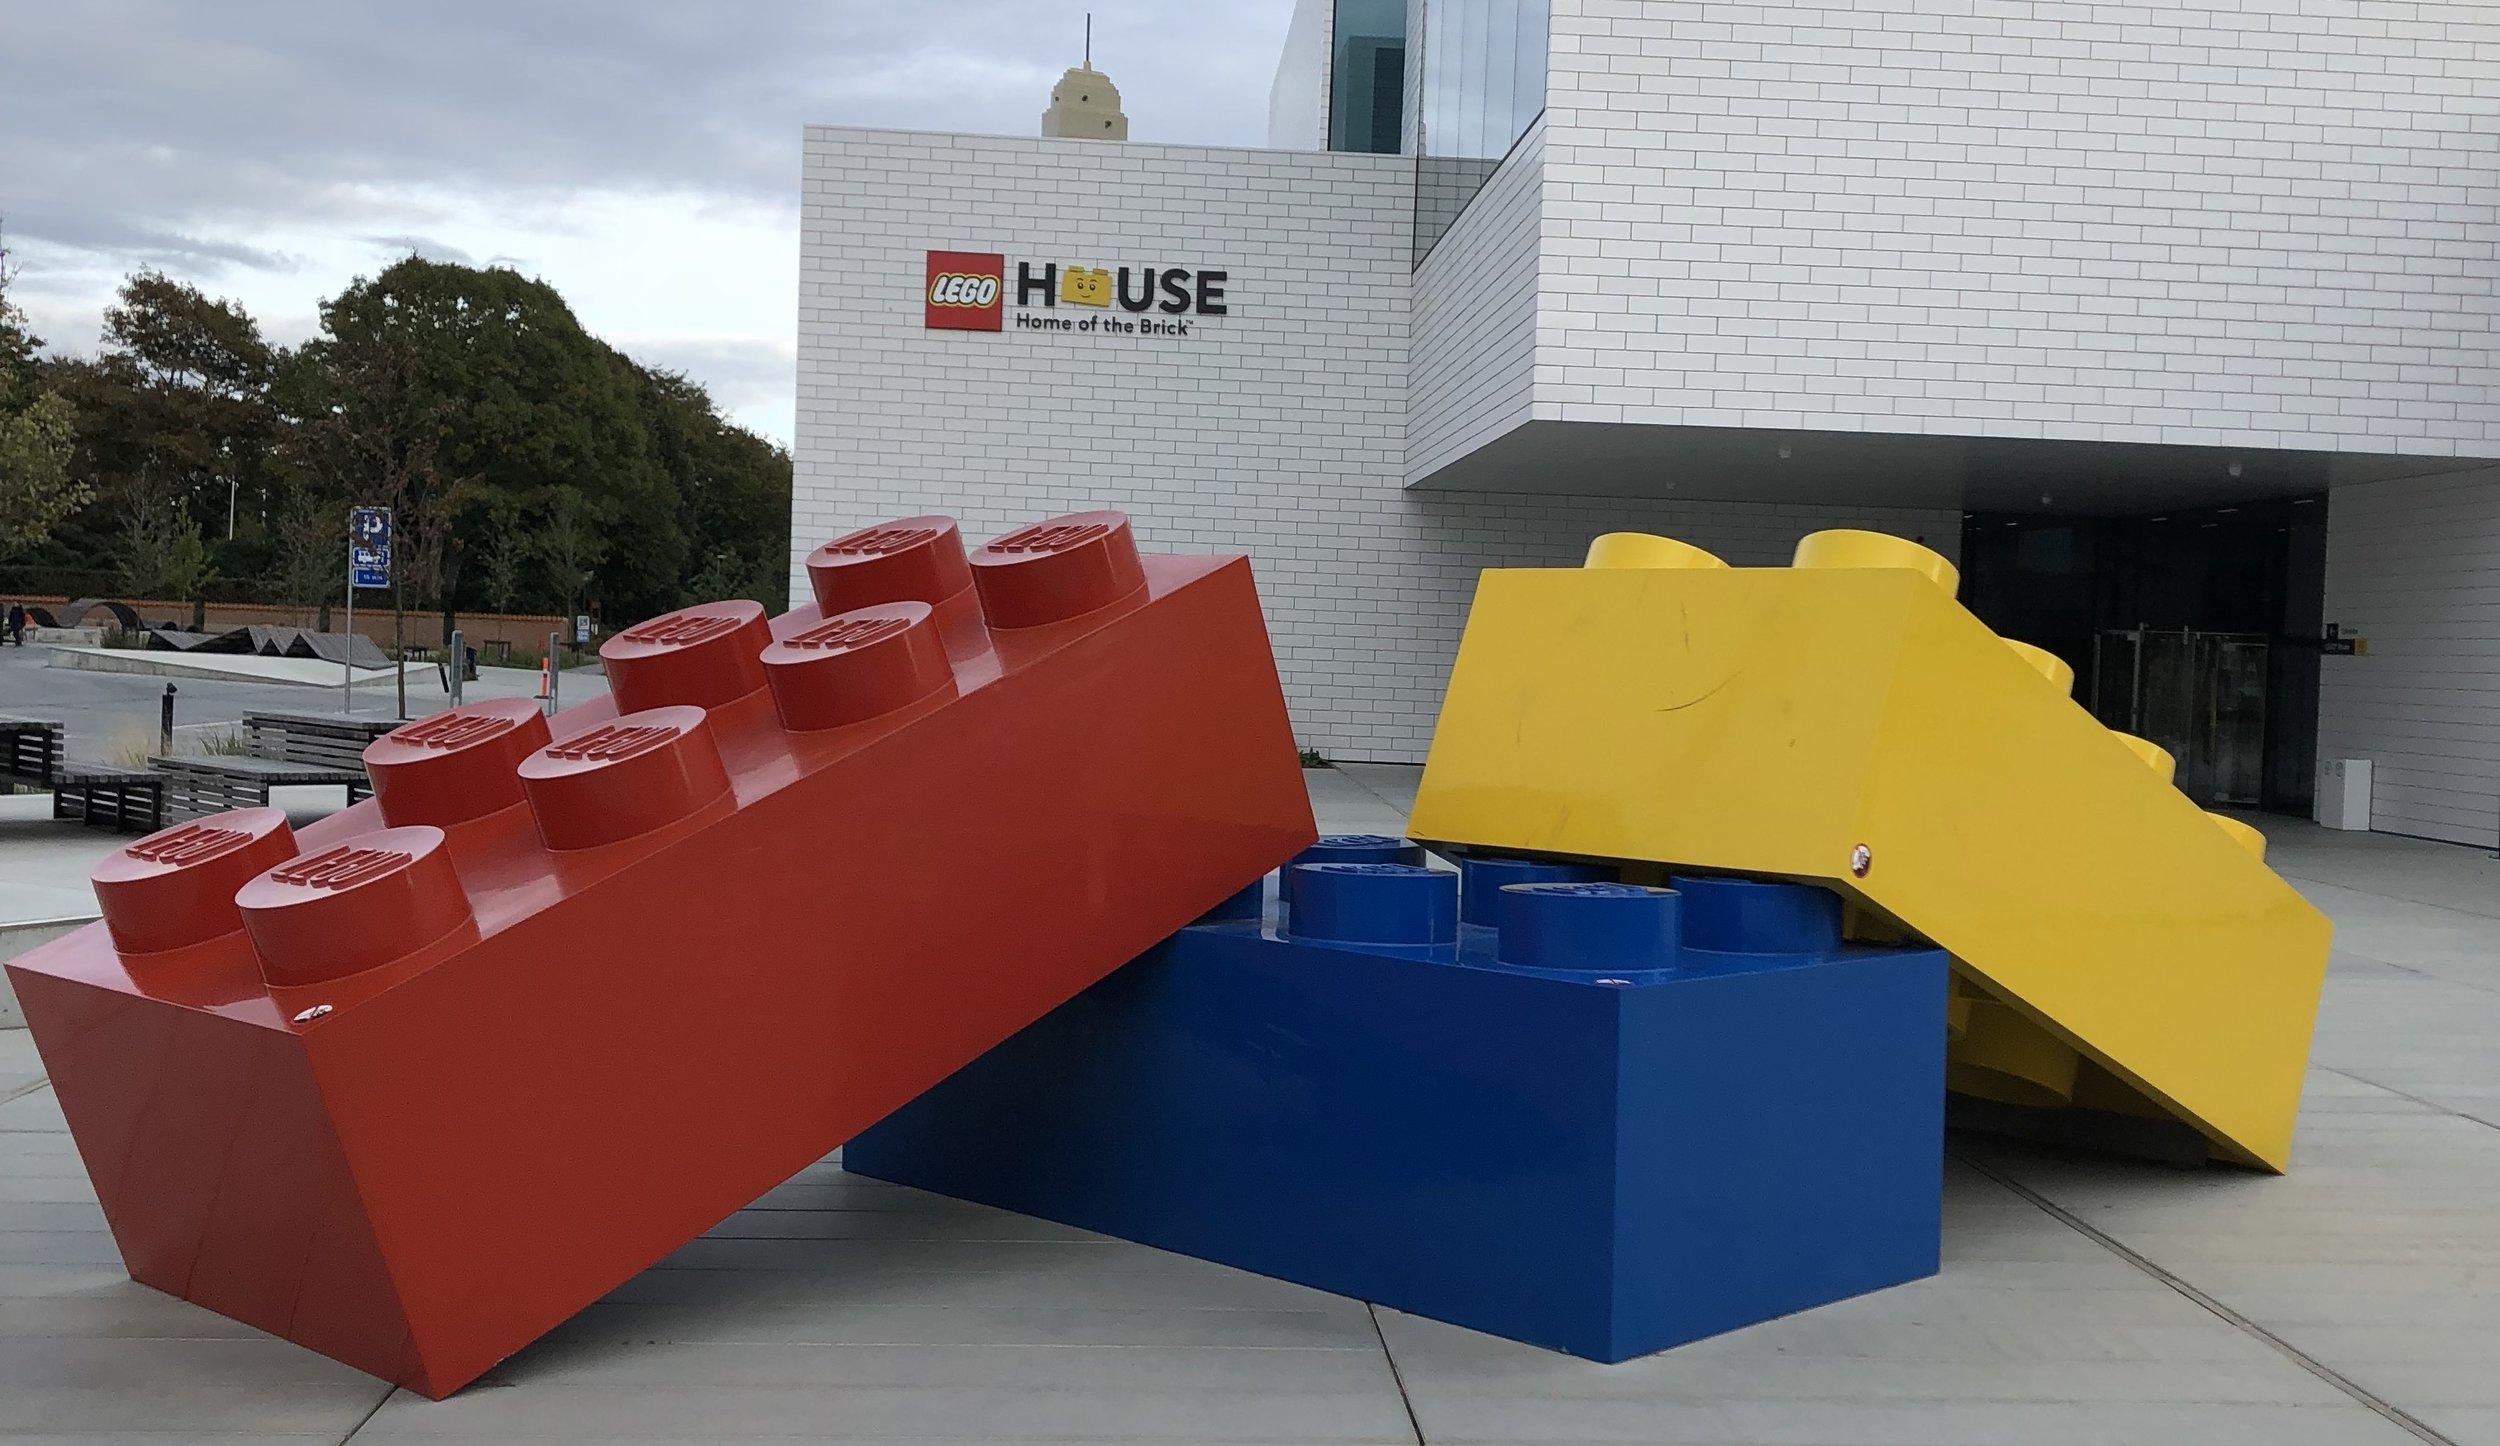 "LEGO House ""Home of the Brick"" in Billund, Denmark"